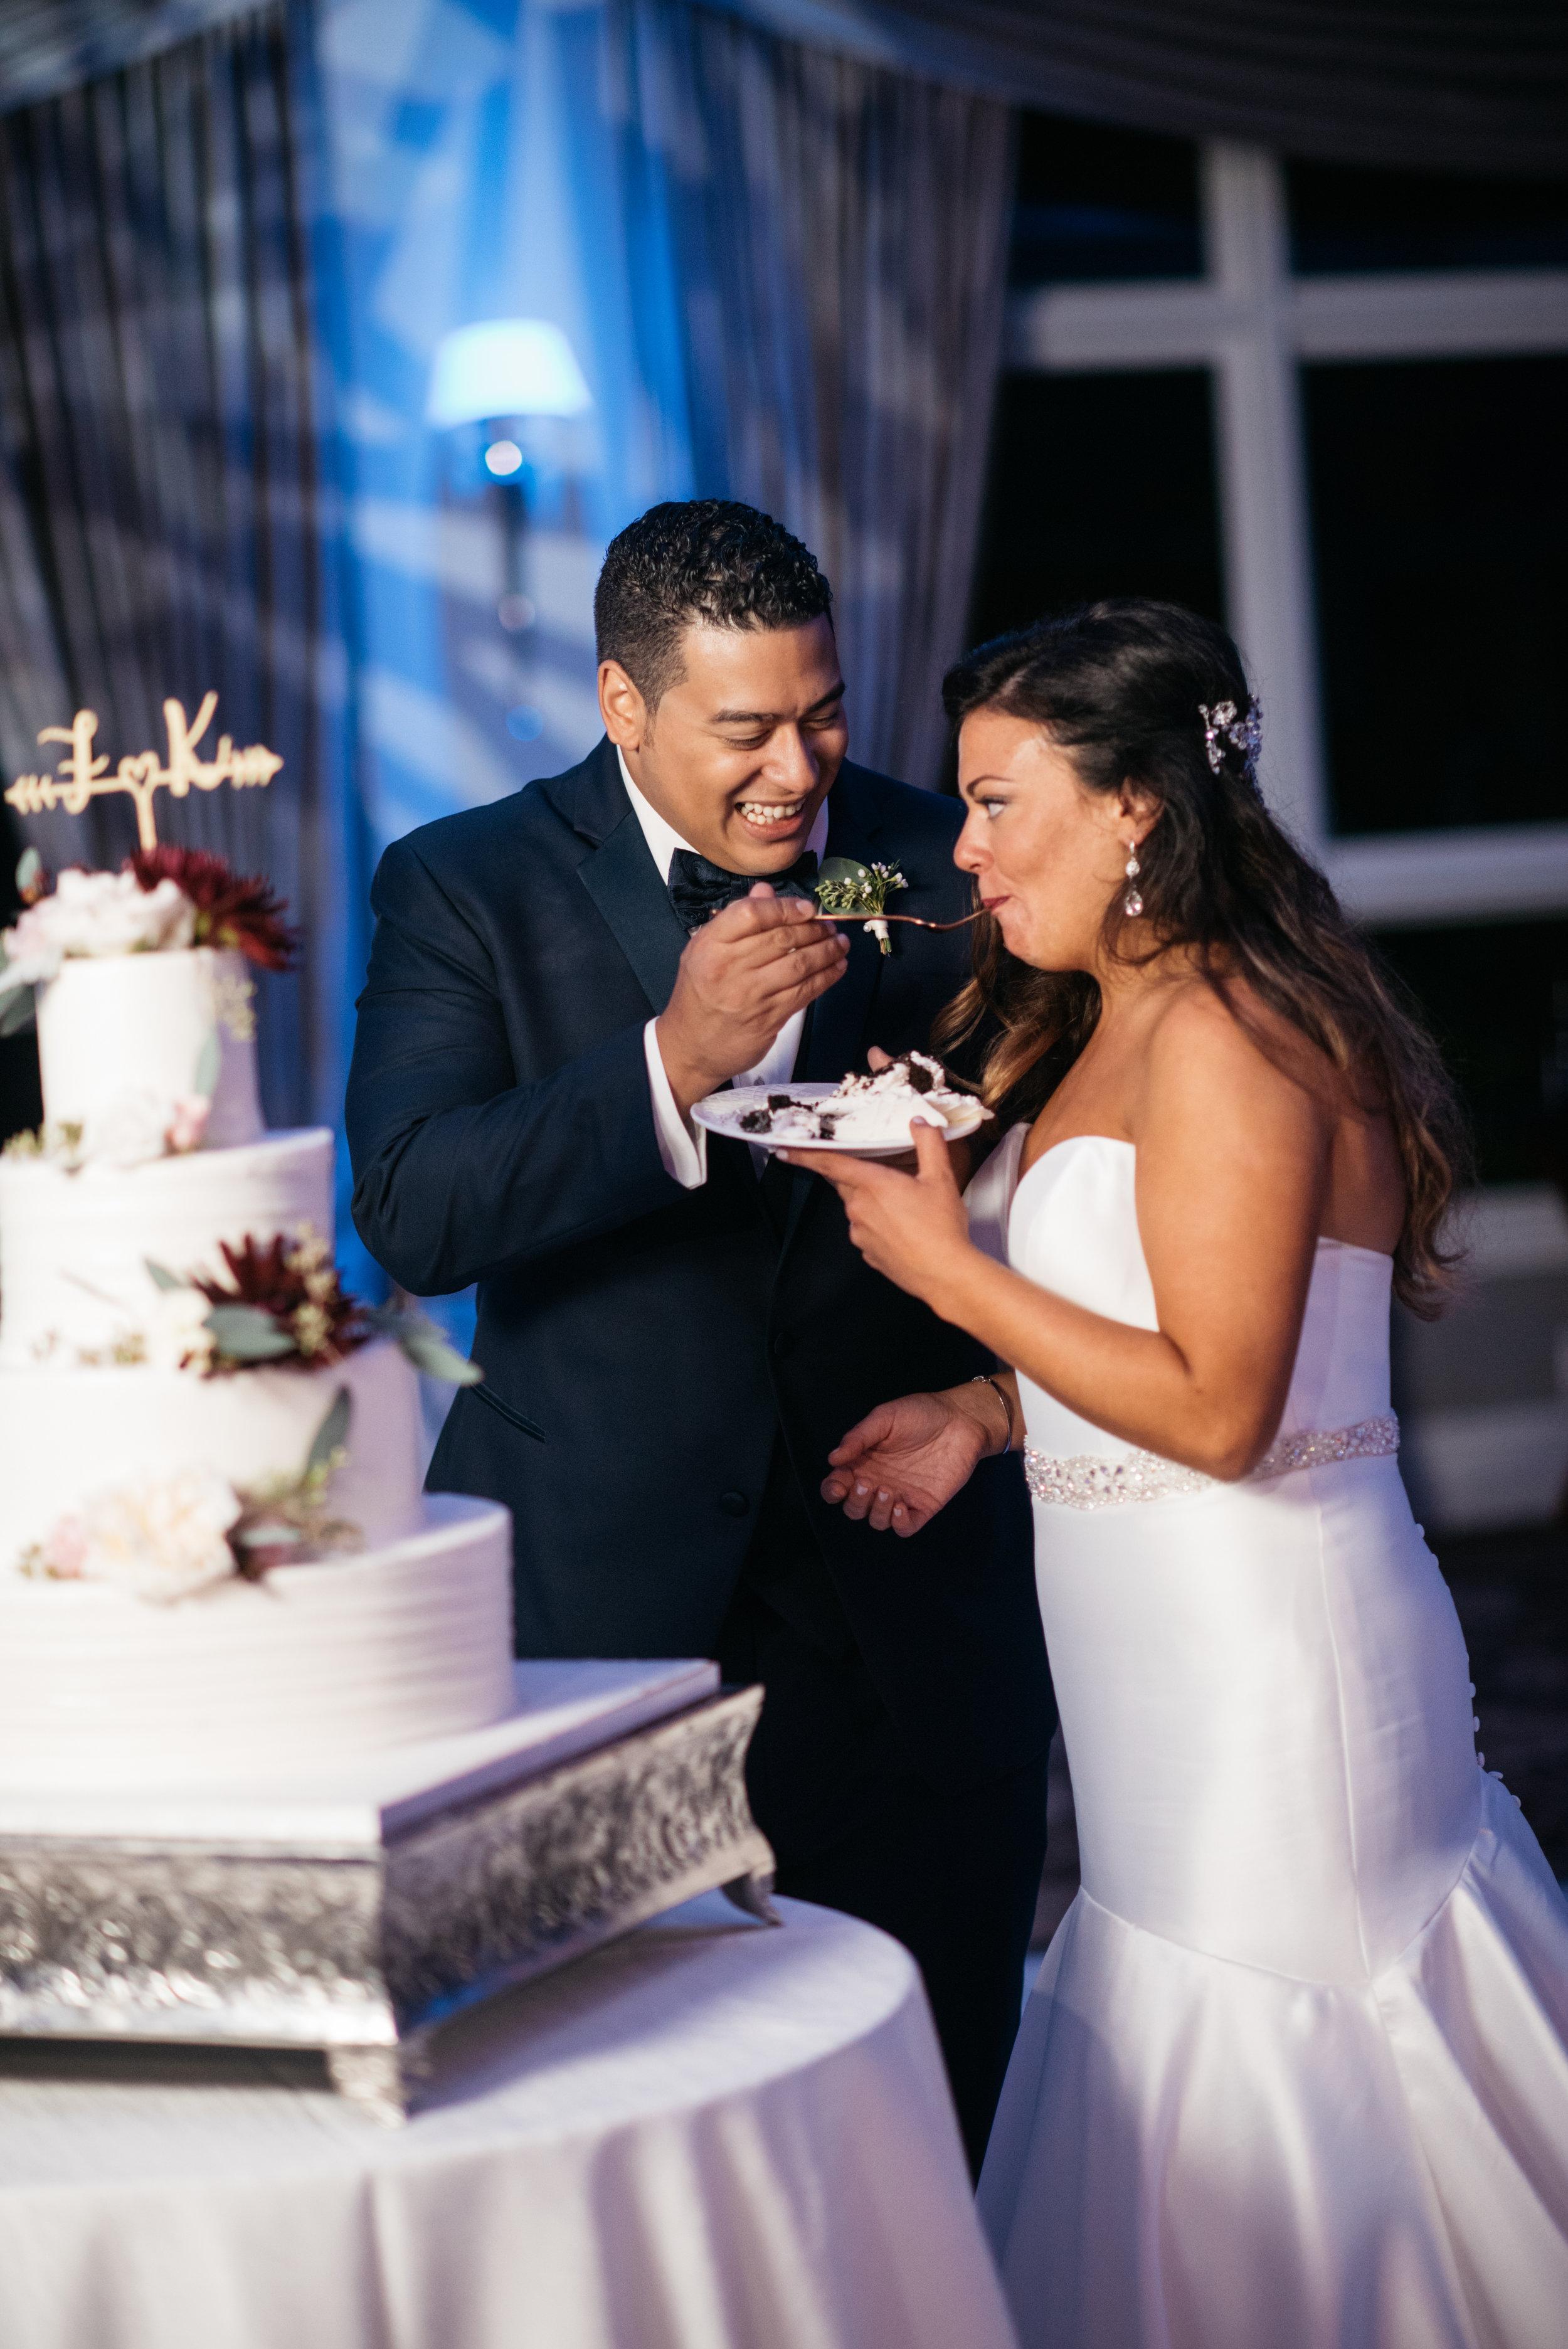 WeddingPhotos | NJPhotographer | Highlights-7-25.jpg